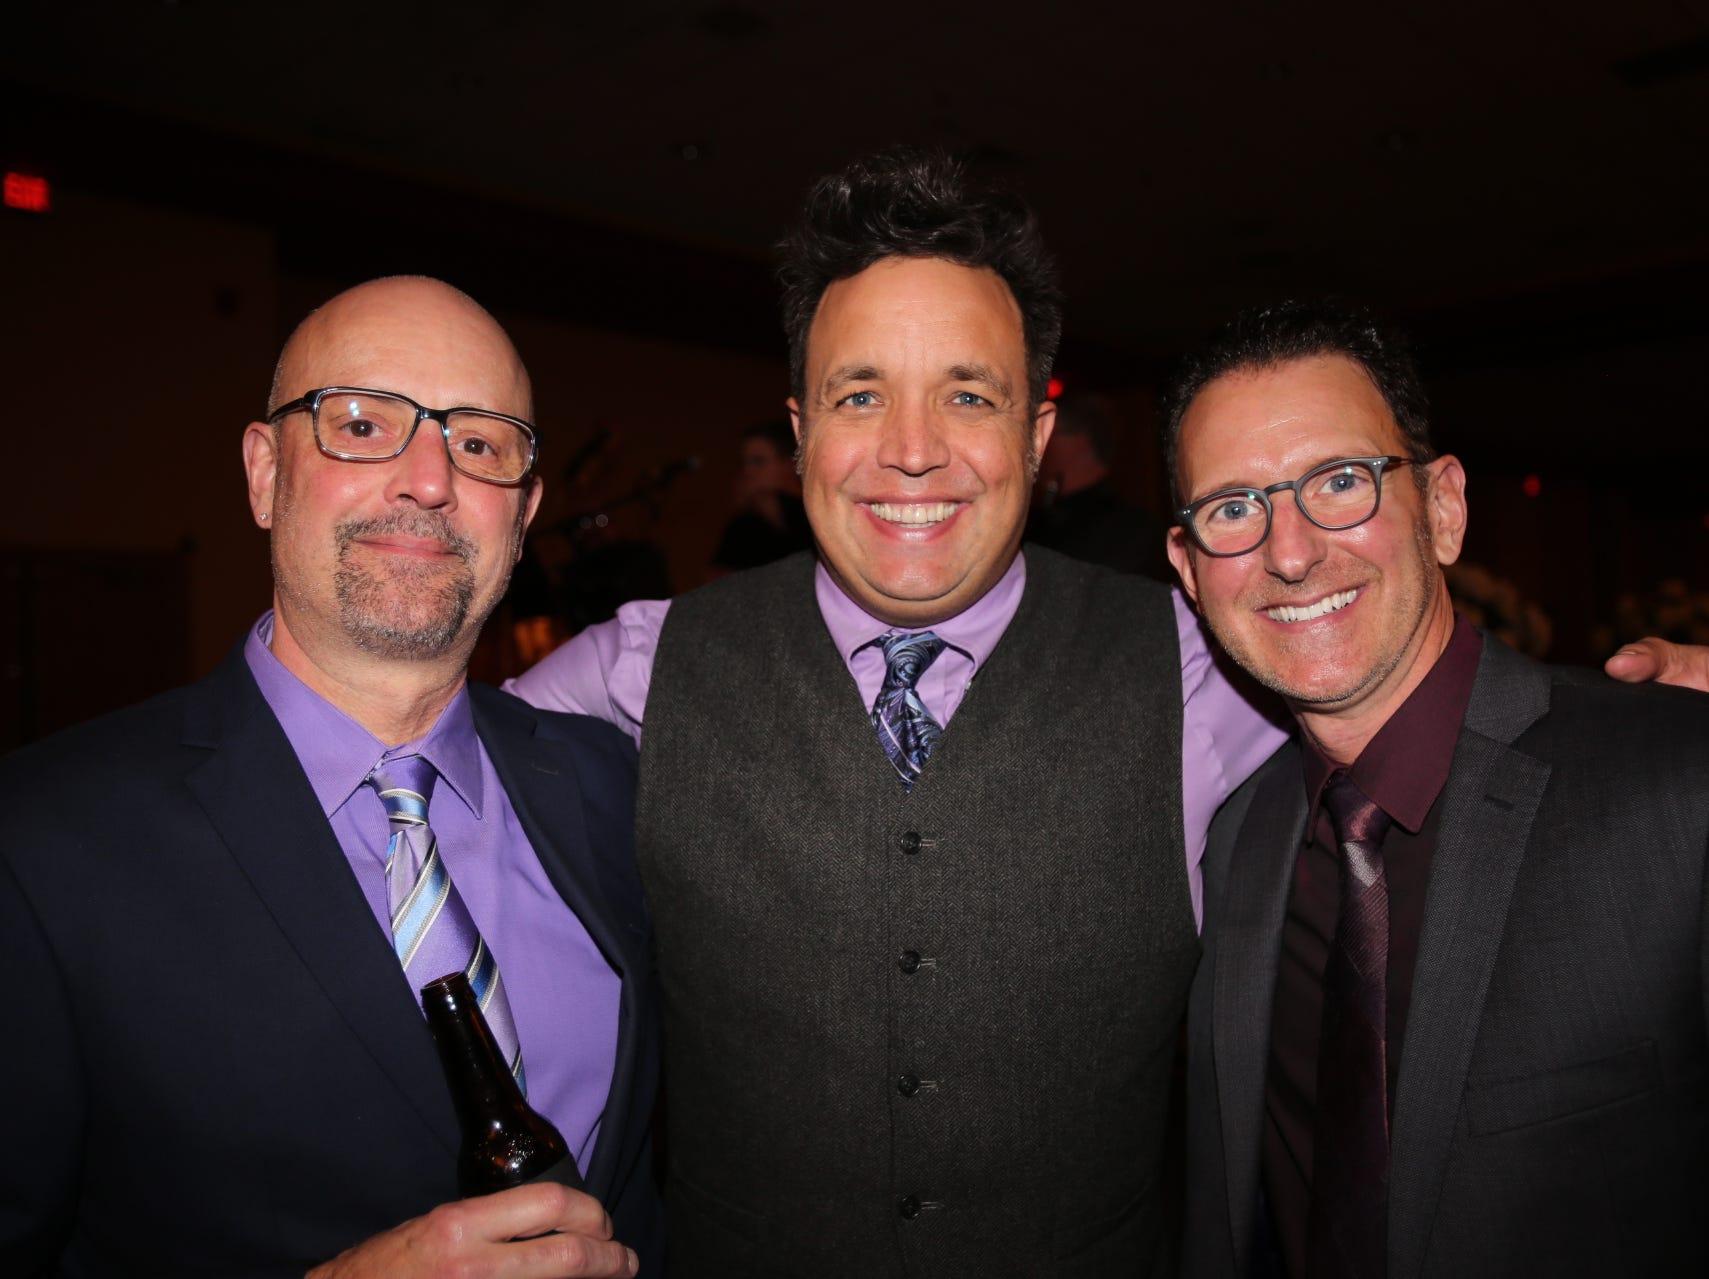 Mike Cates, Uli, and Doug Carter